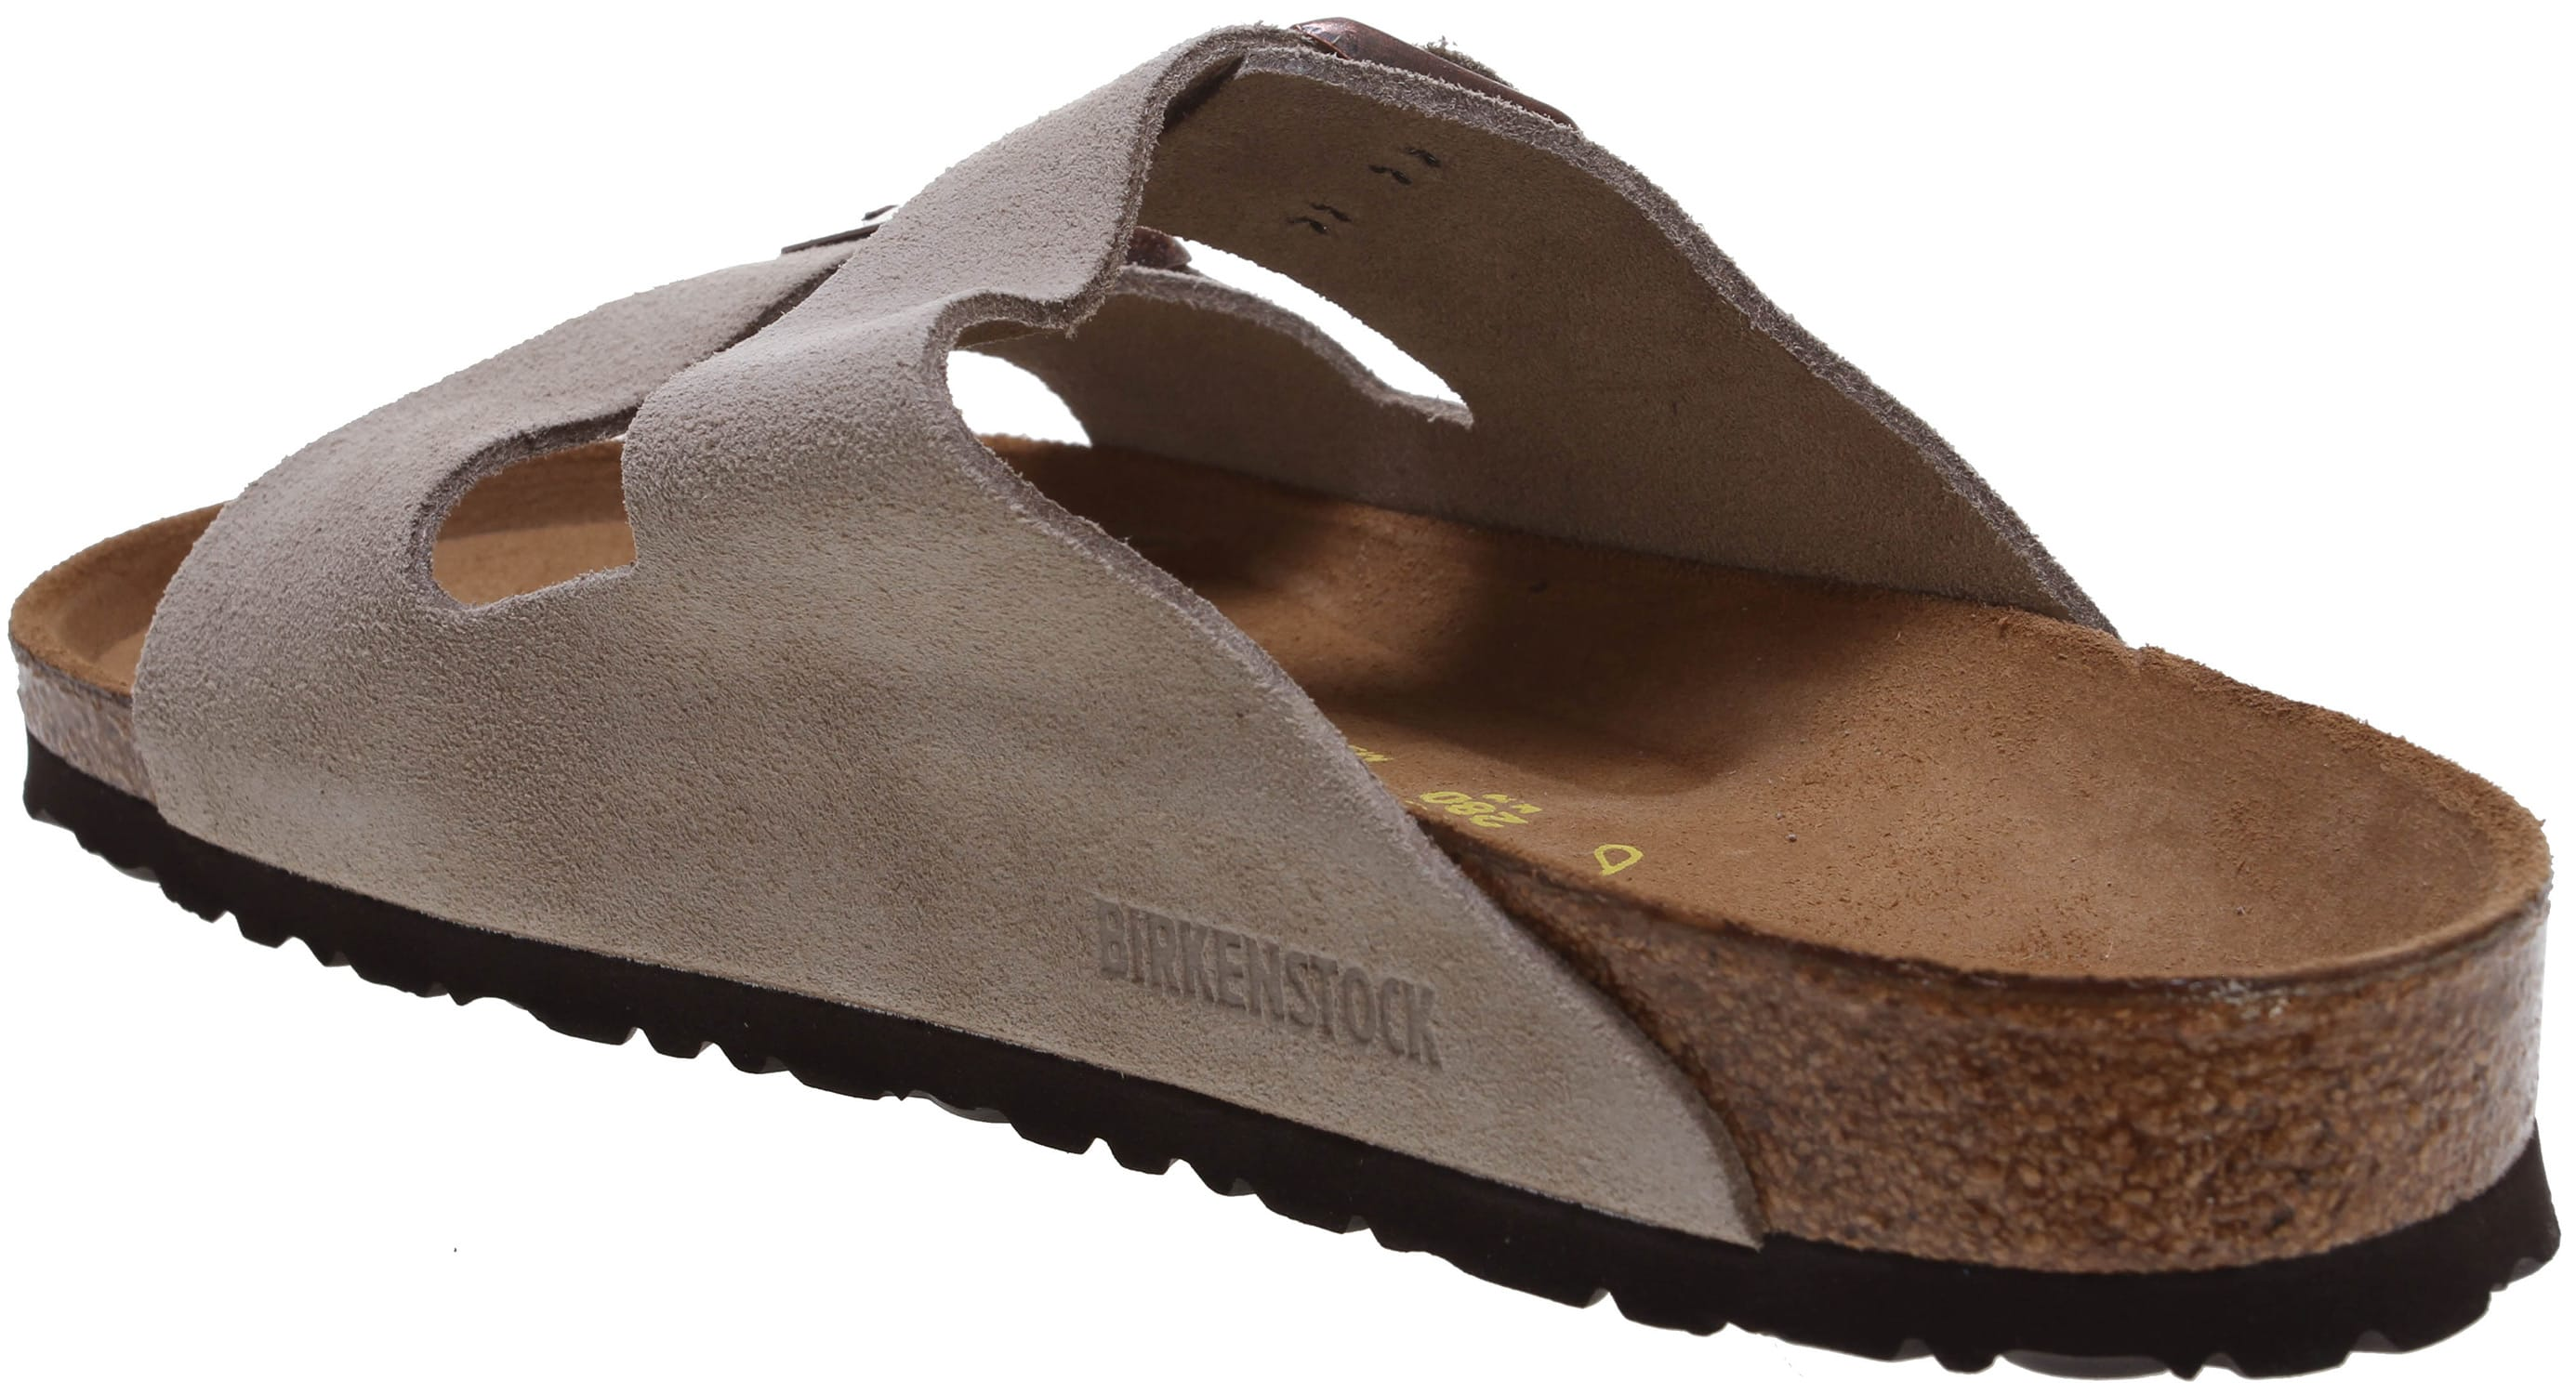 44c11ca1673 Birkenstock Usa Corporate Office Brands Online Shopping